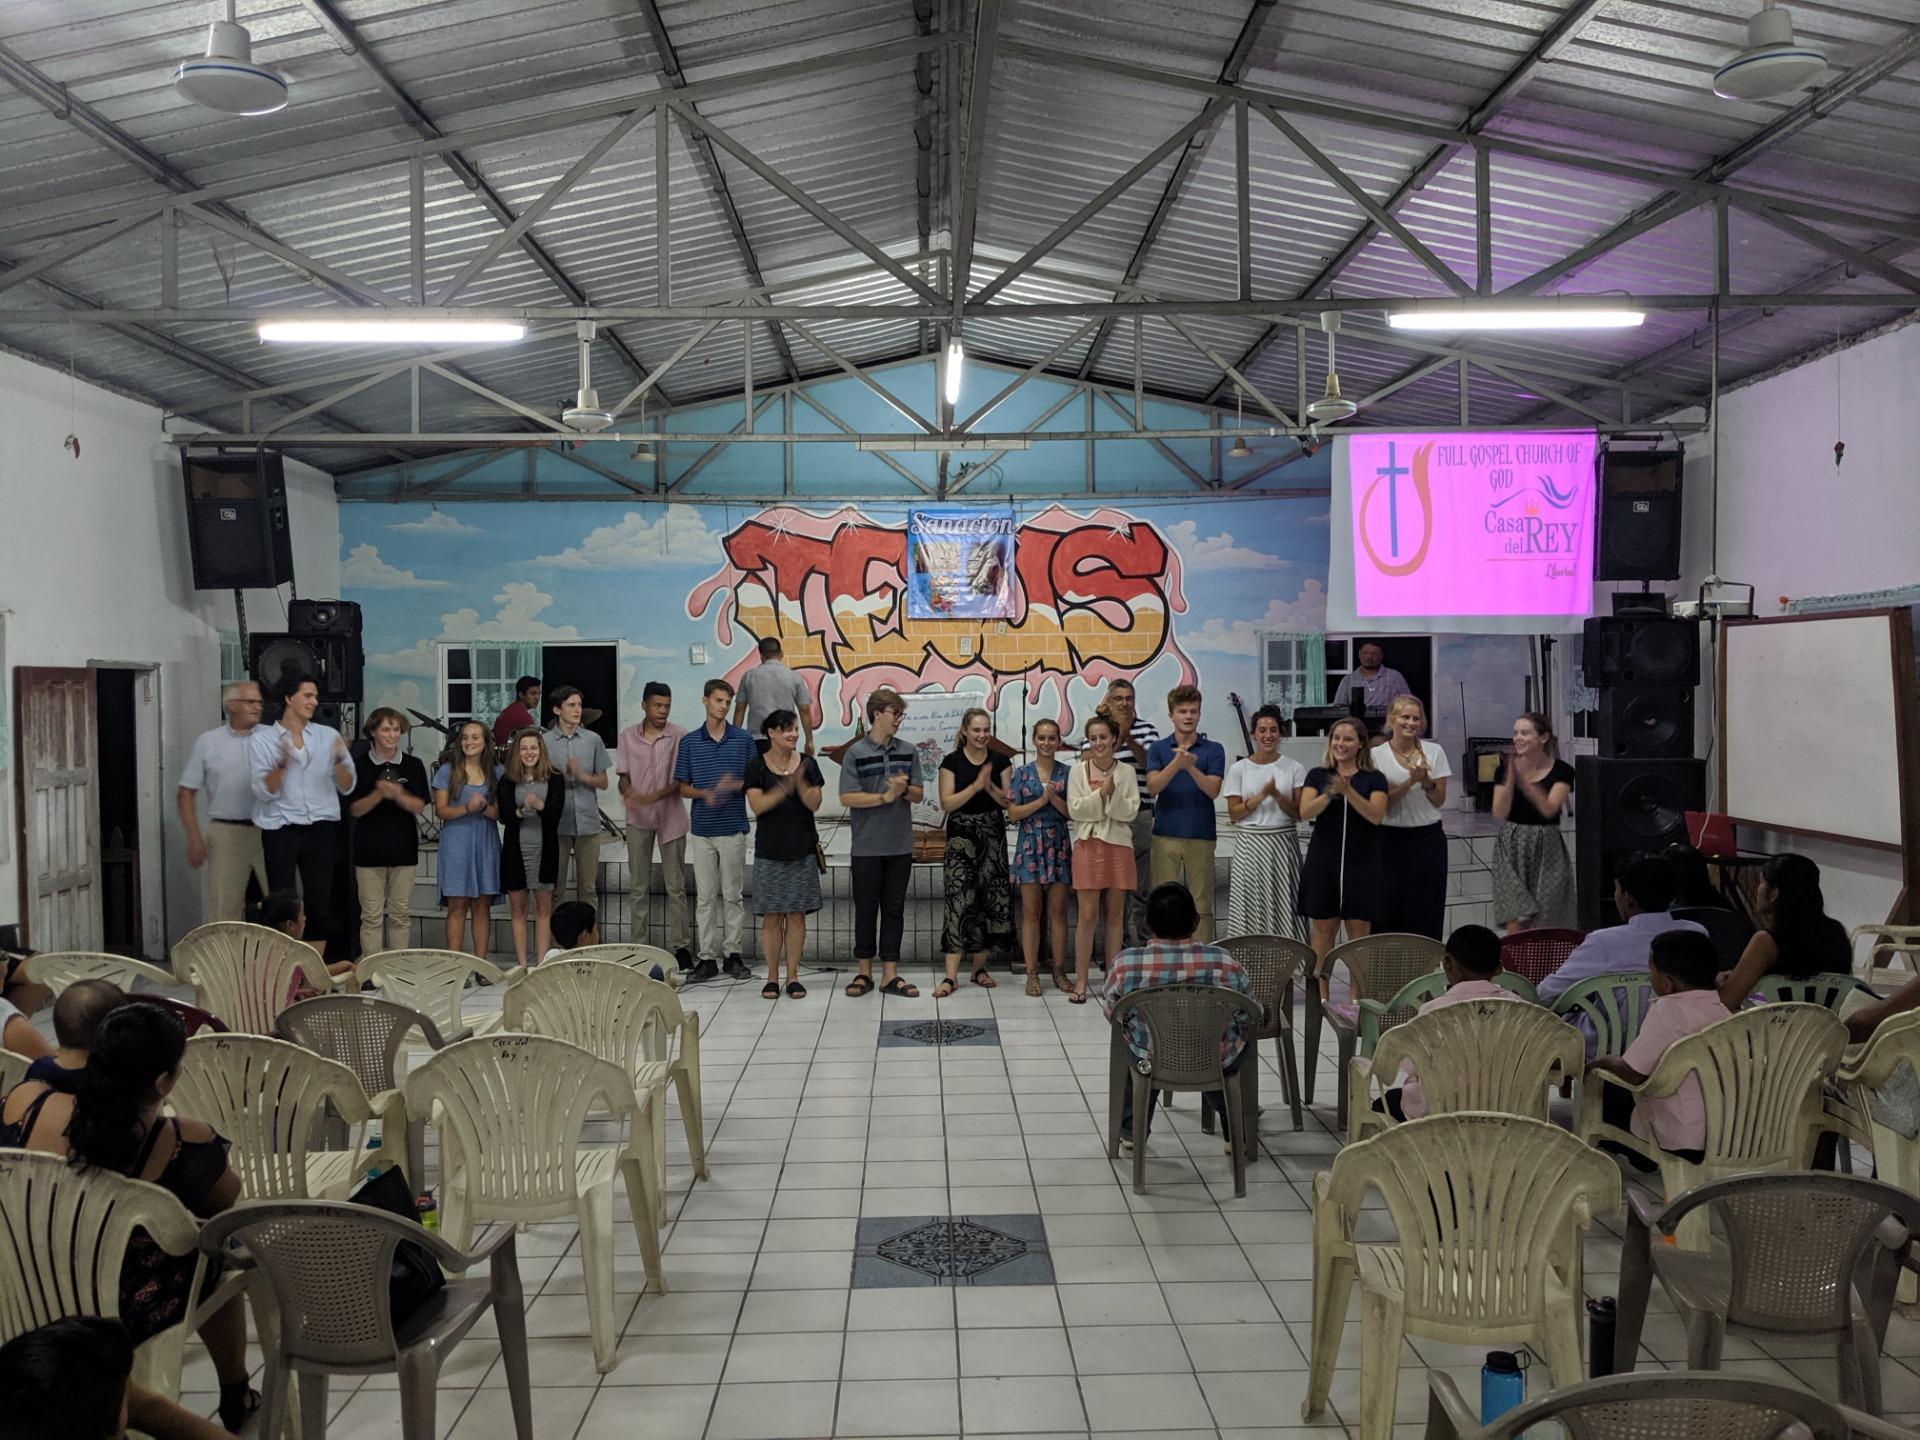 Sunday Evening Service - Trinity Lutheran Church in Belize